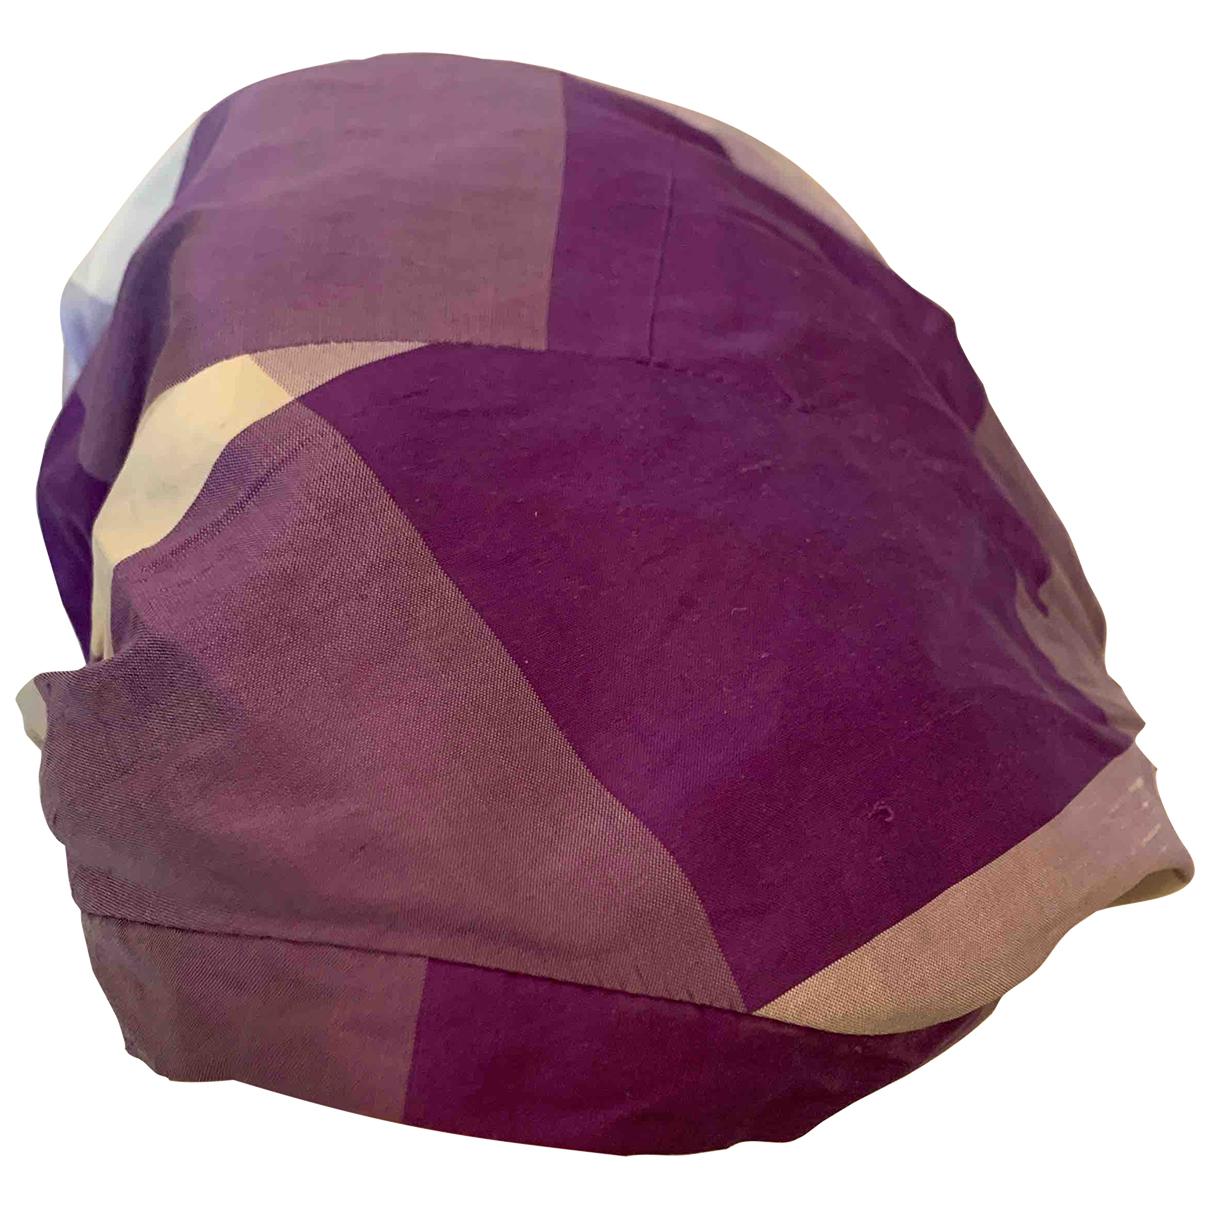 Eugenia Kim \N Purple hat for Women S International